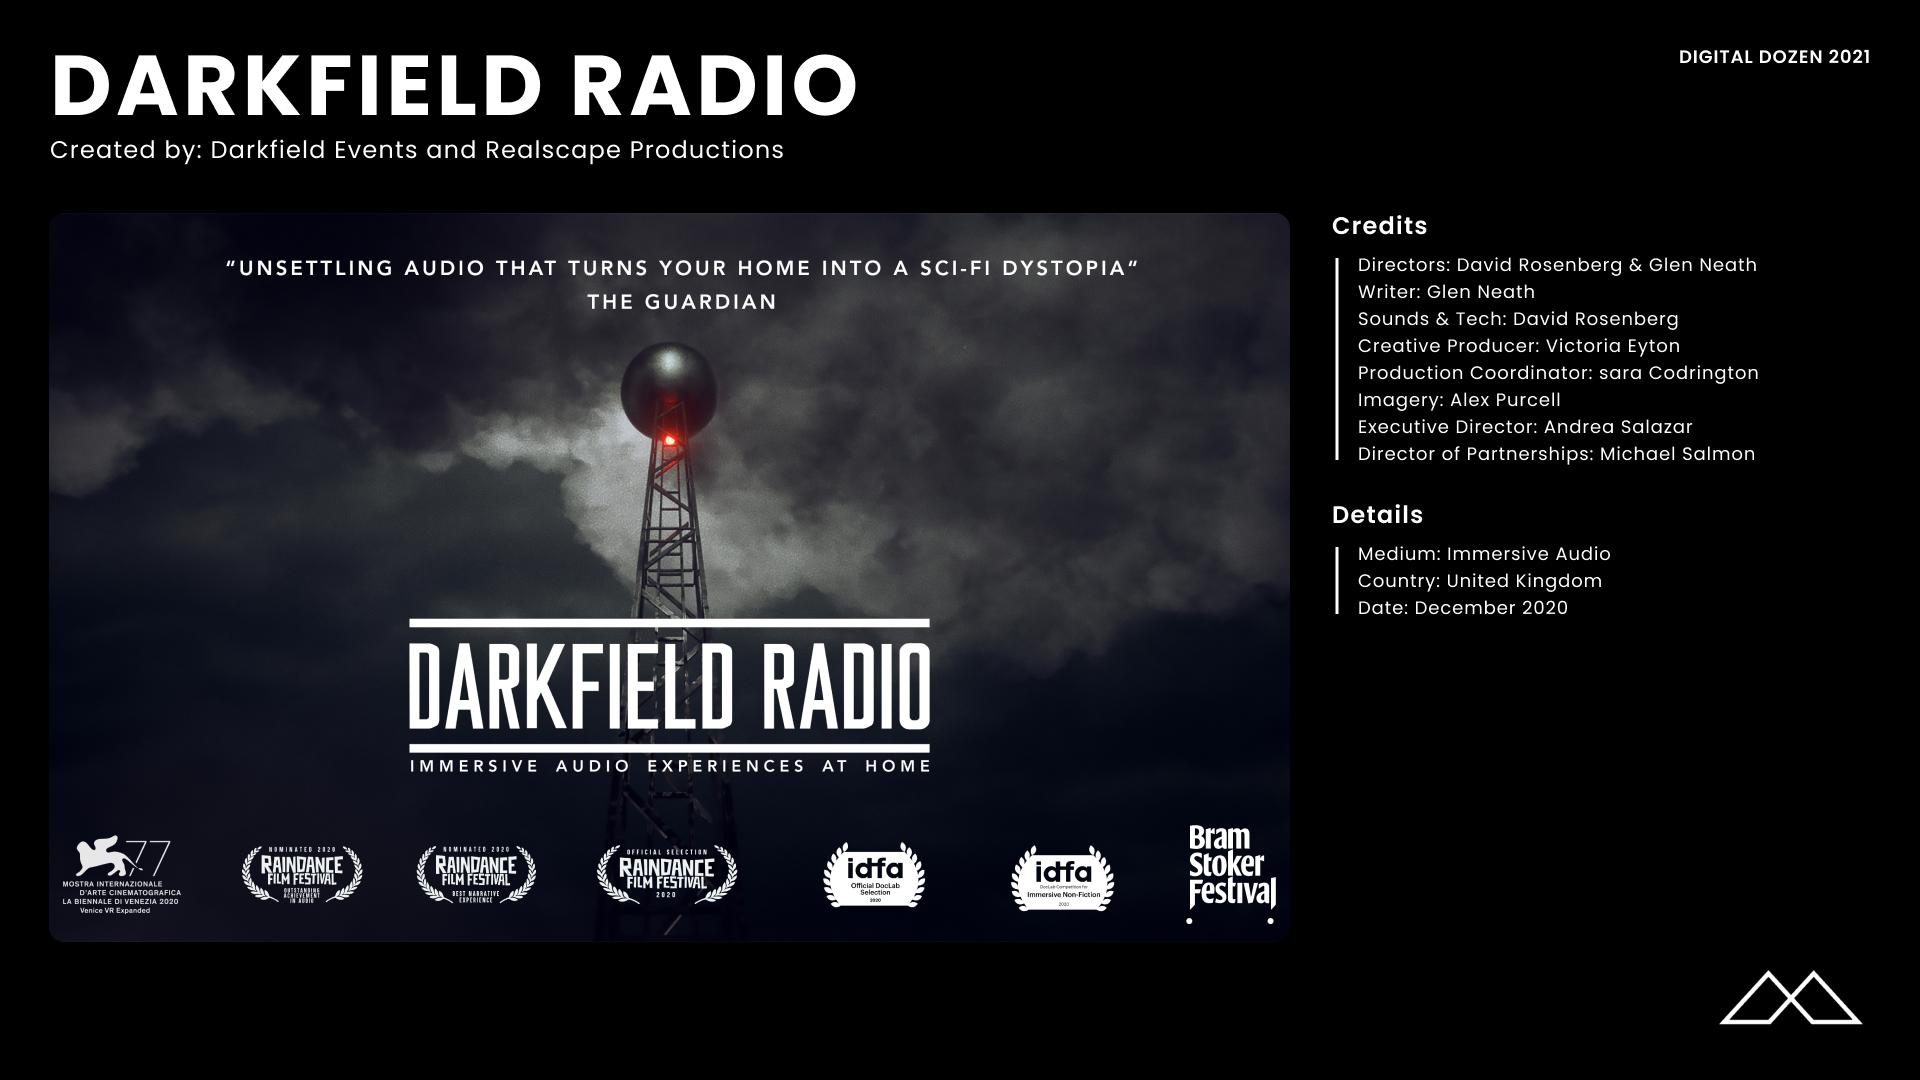 Darkfield Radio Credits